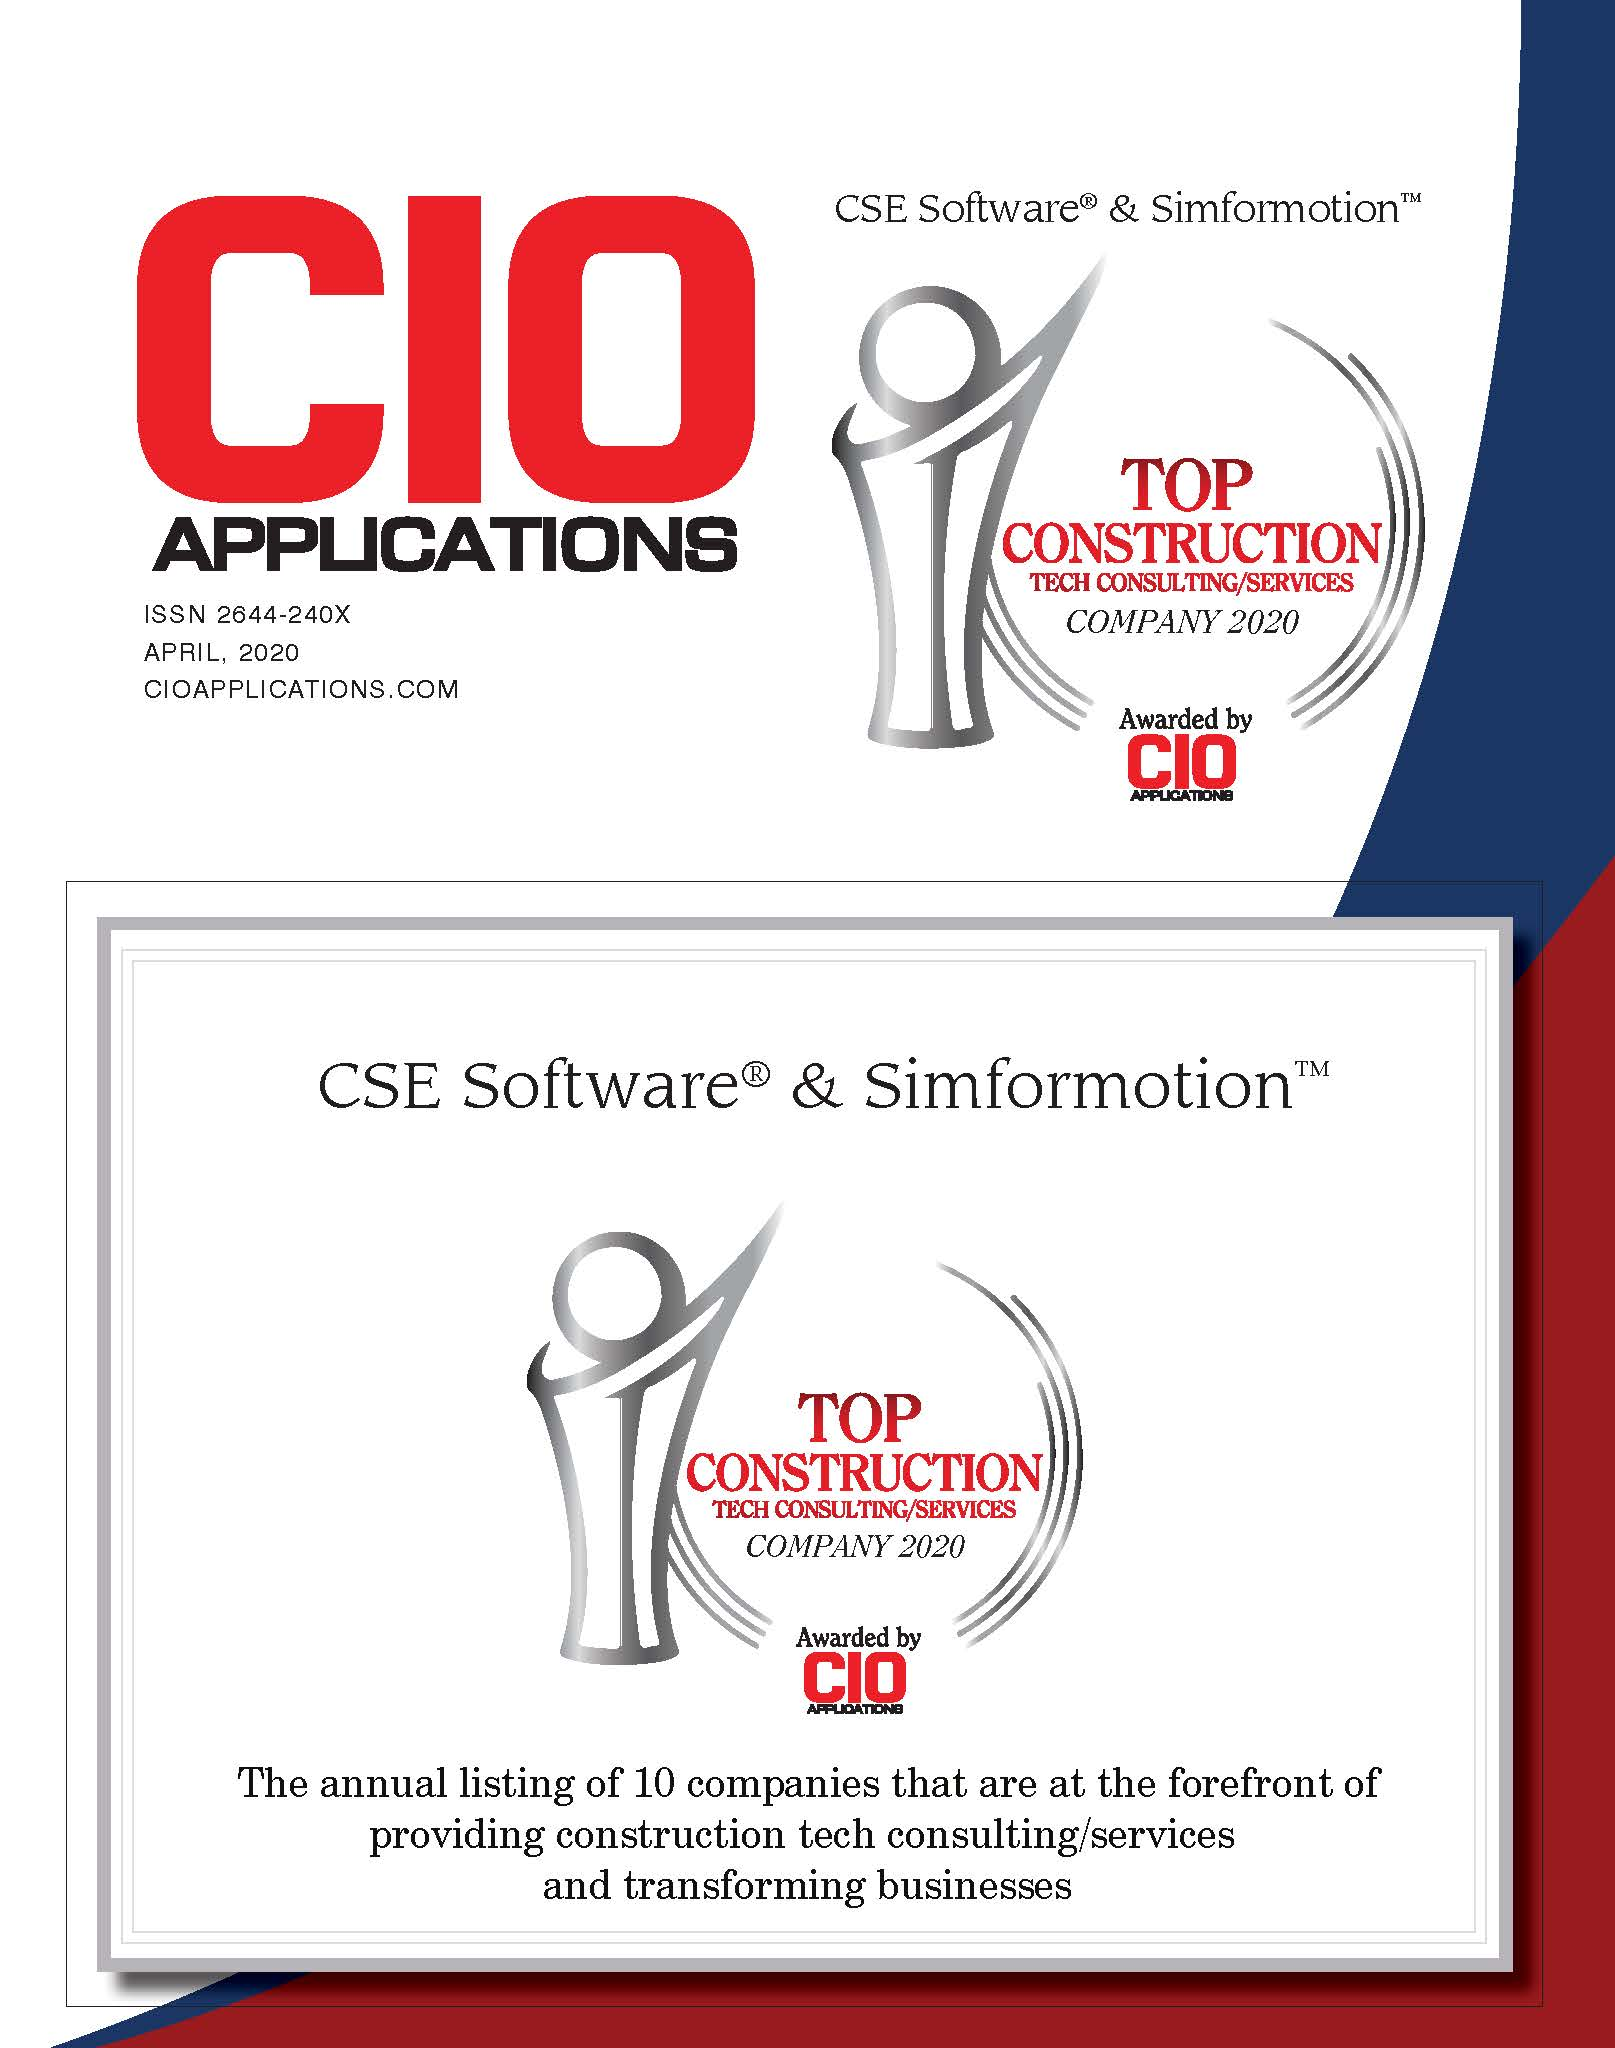 CSE SOFTWARE® INC. NAMED TOP CONSTRUCTION TECH SERVICES COMPANY